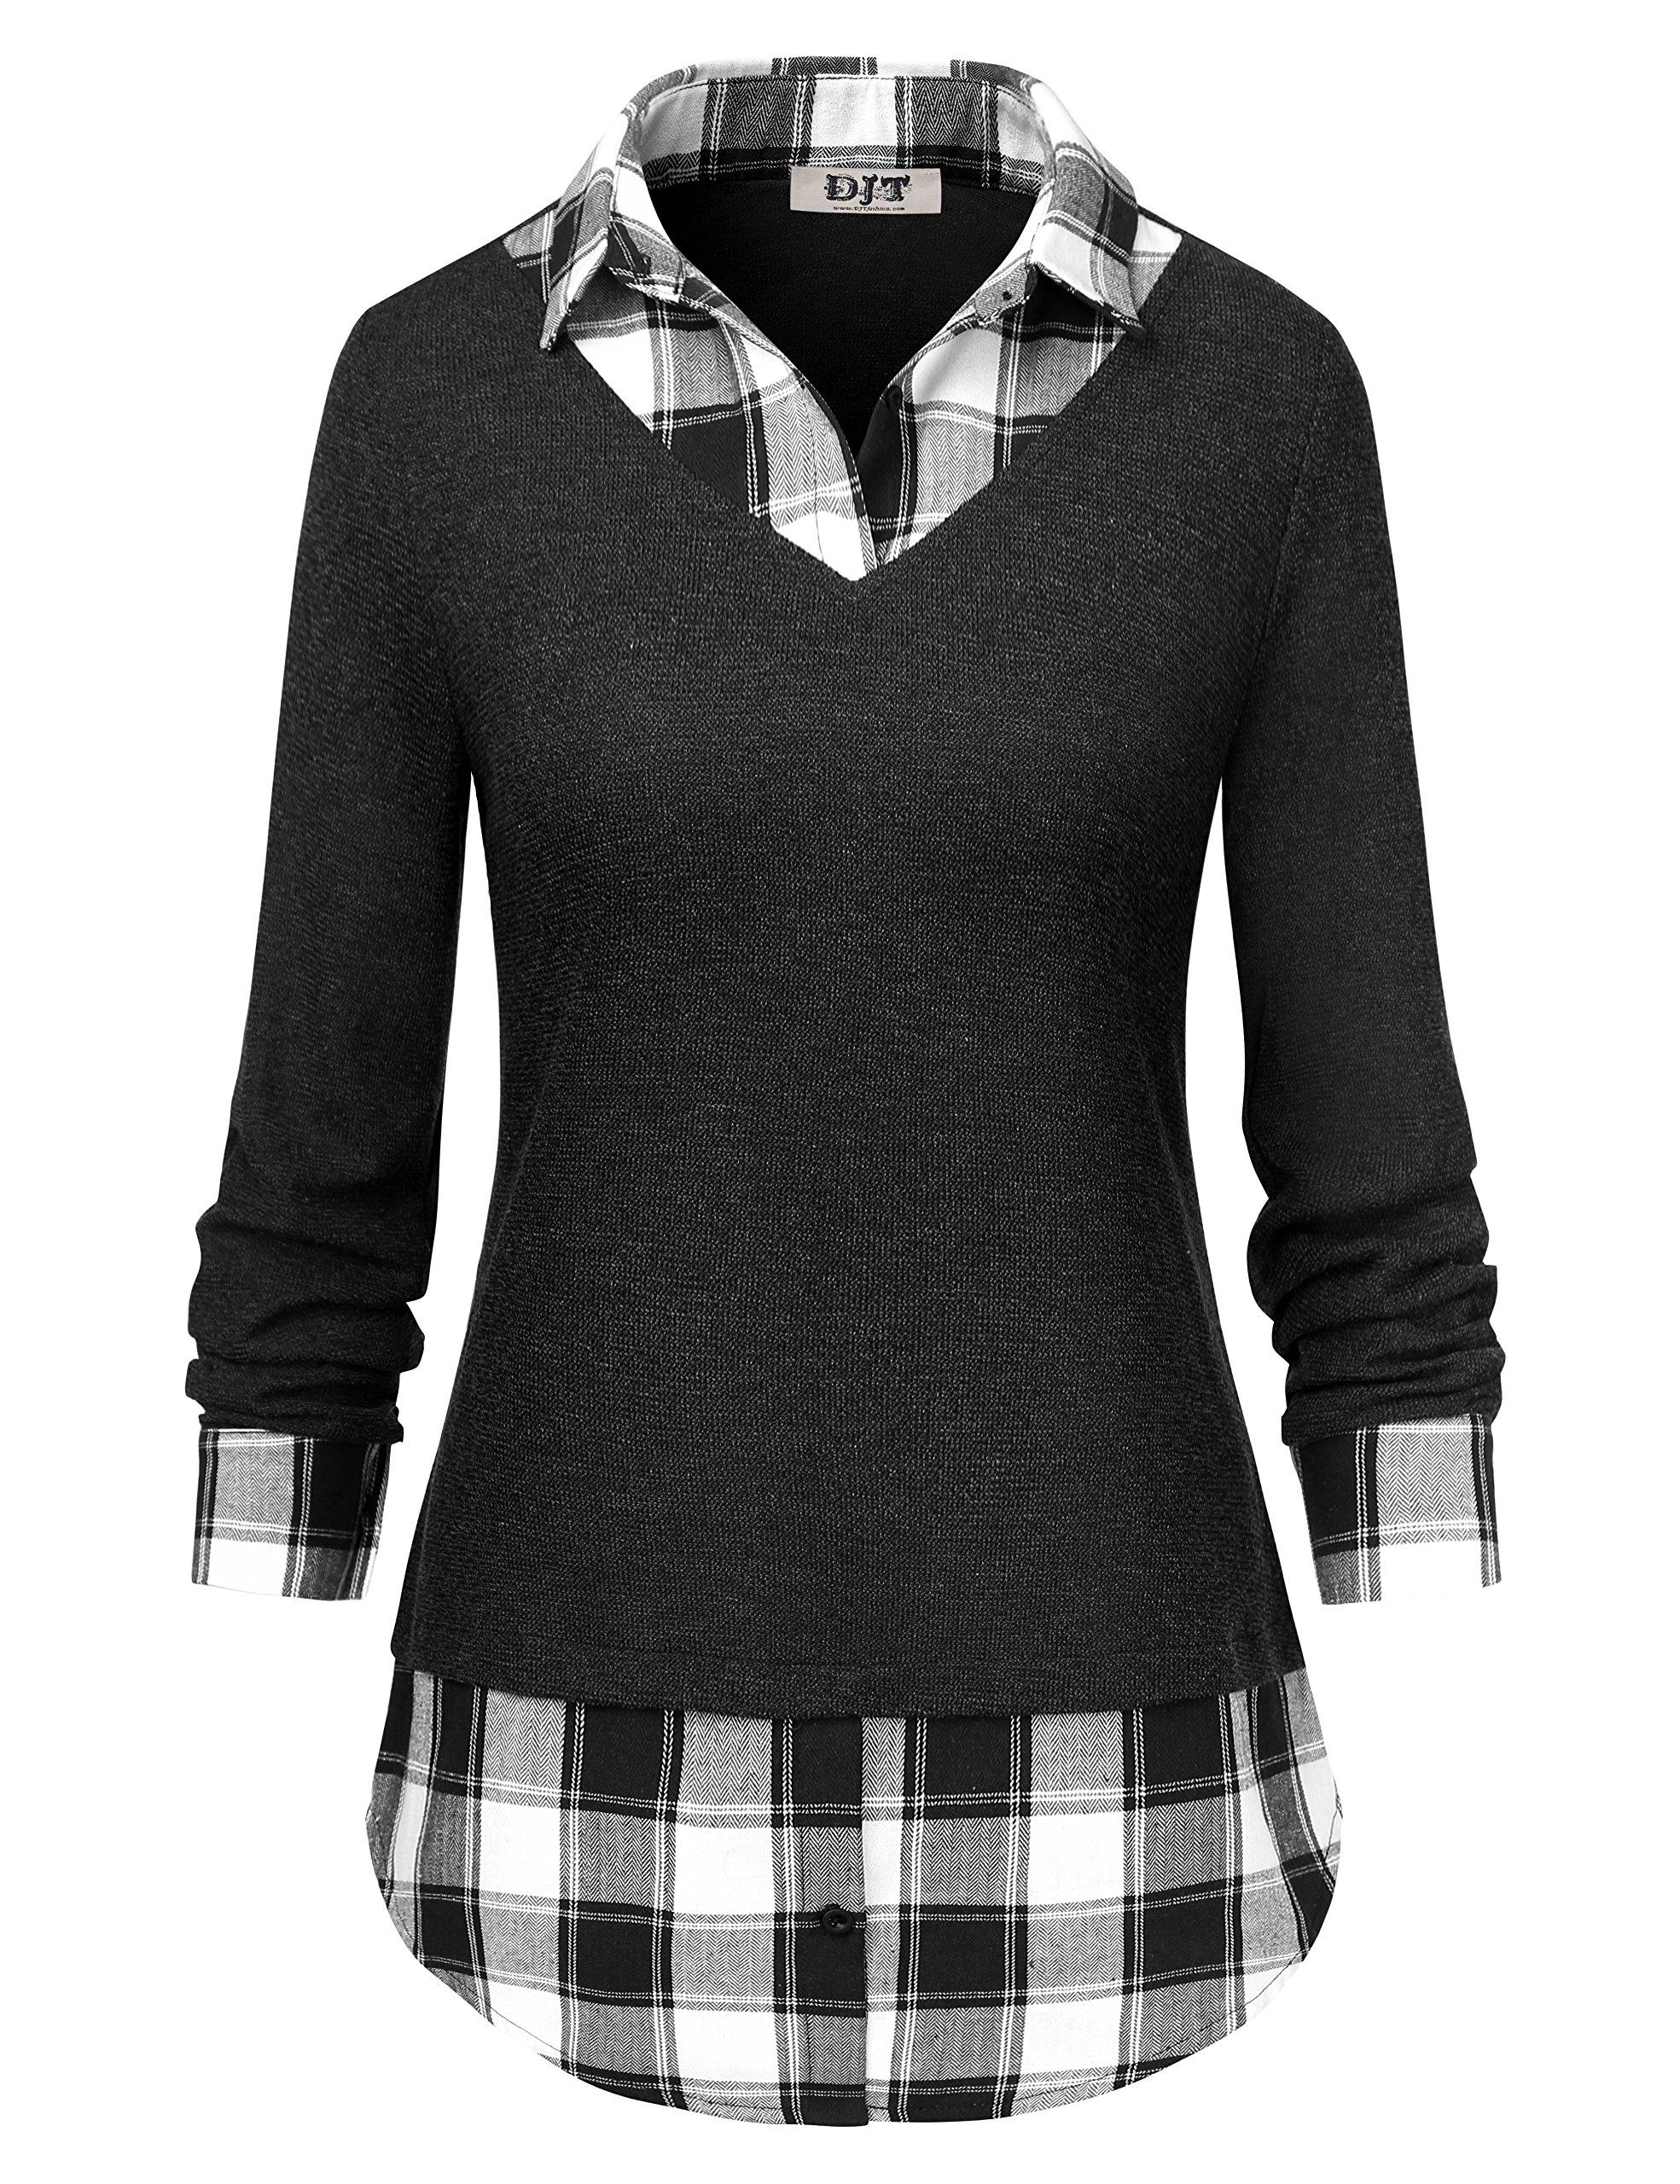 Femme Notes Et Selon Shirts T Top Les Tops pwqxnPfSav